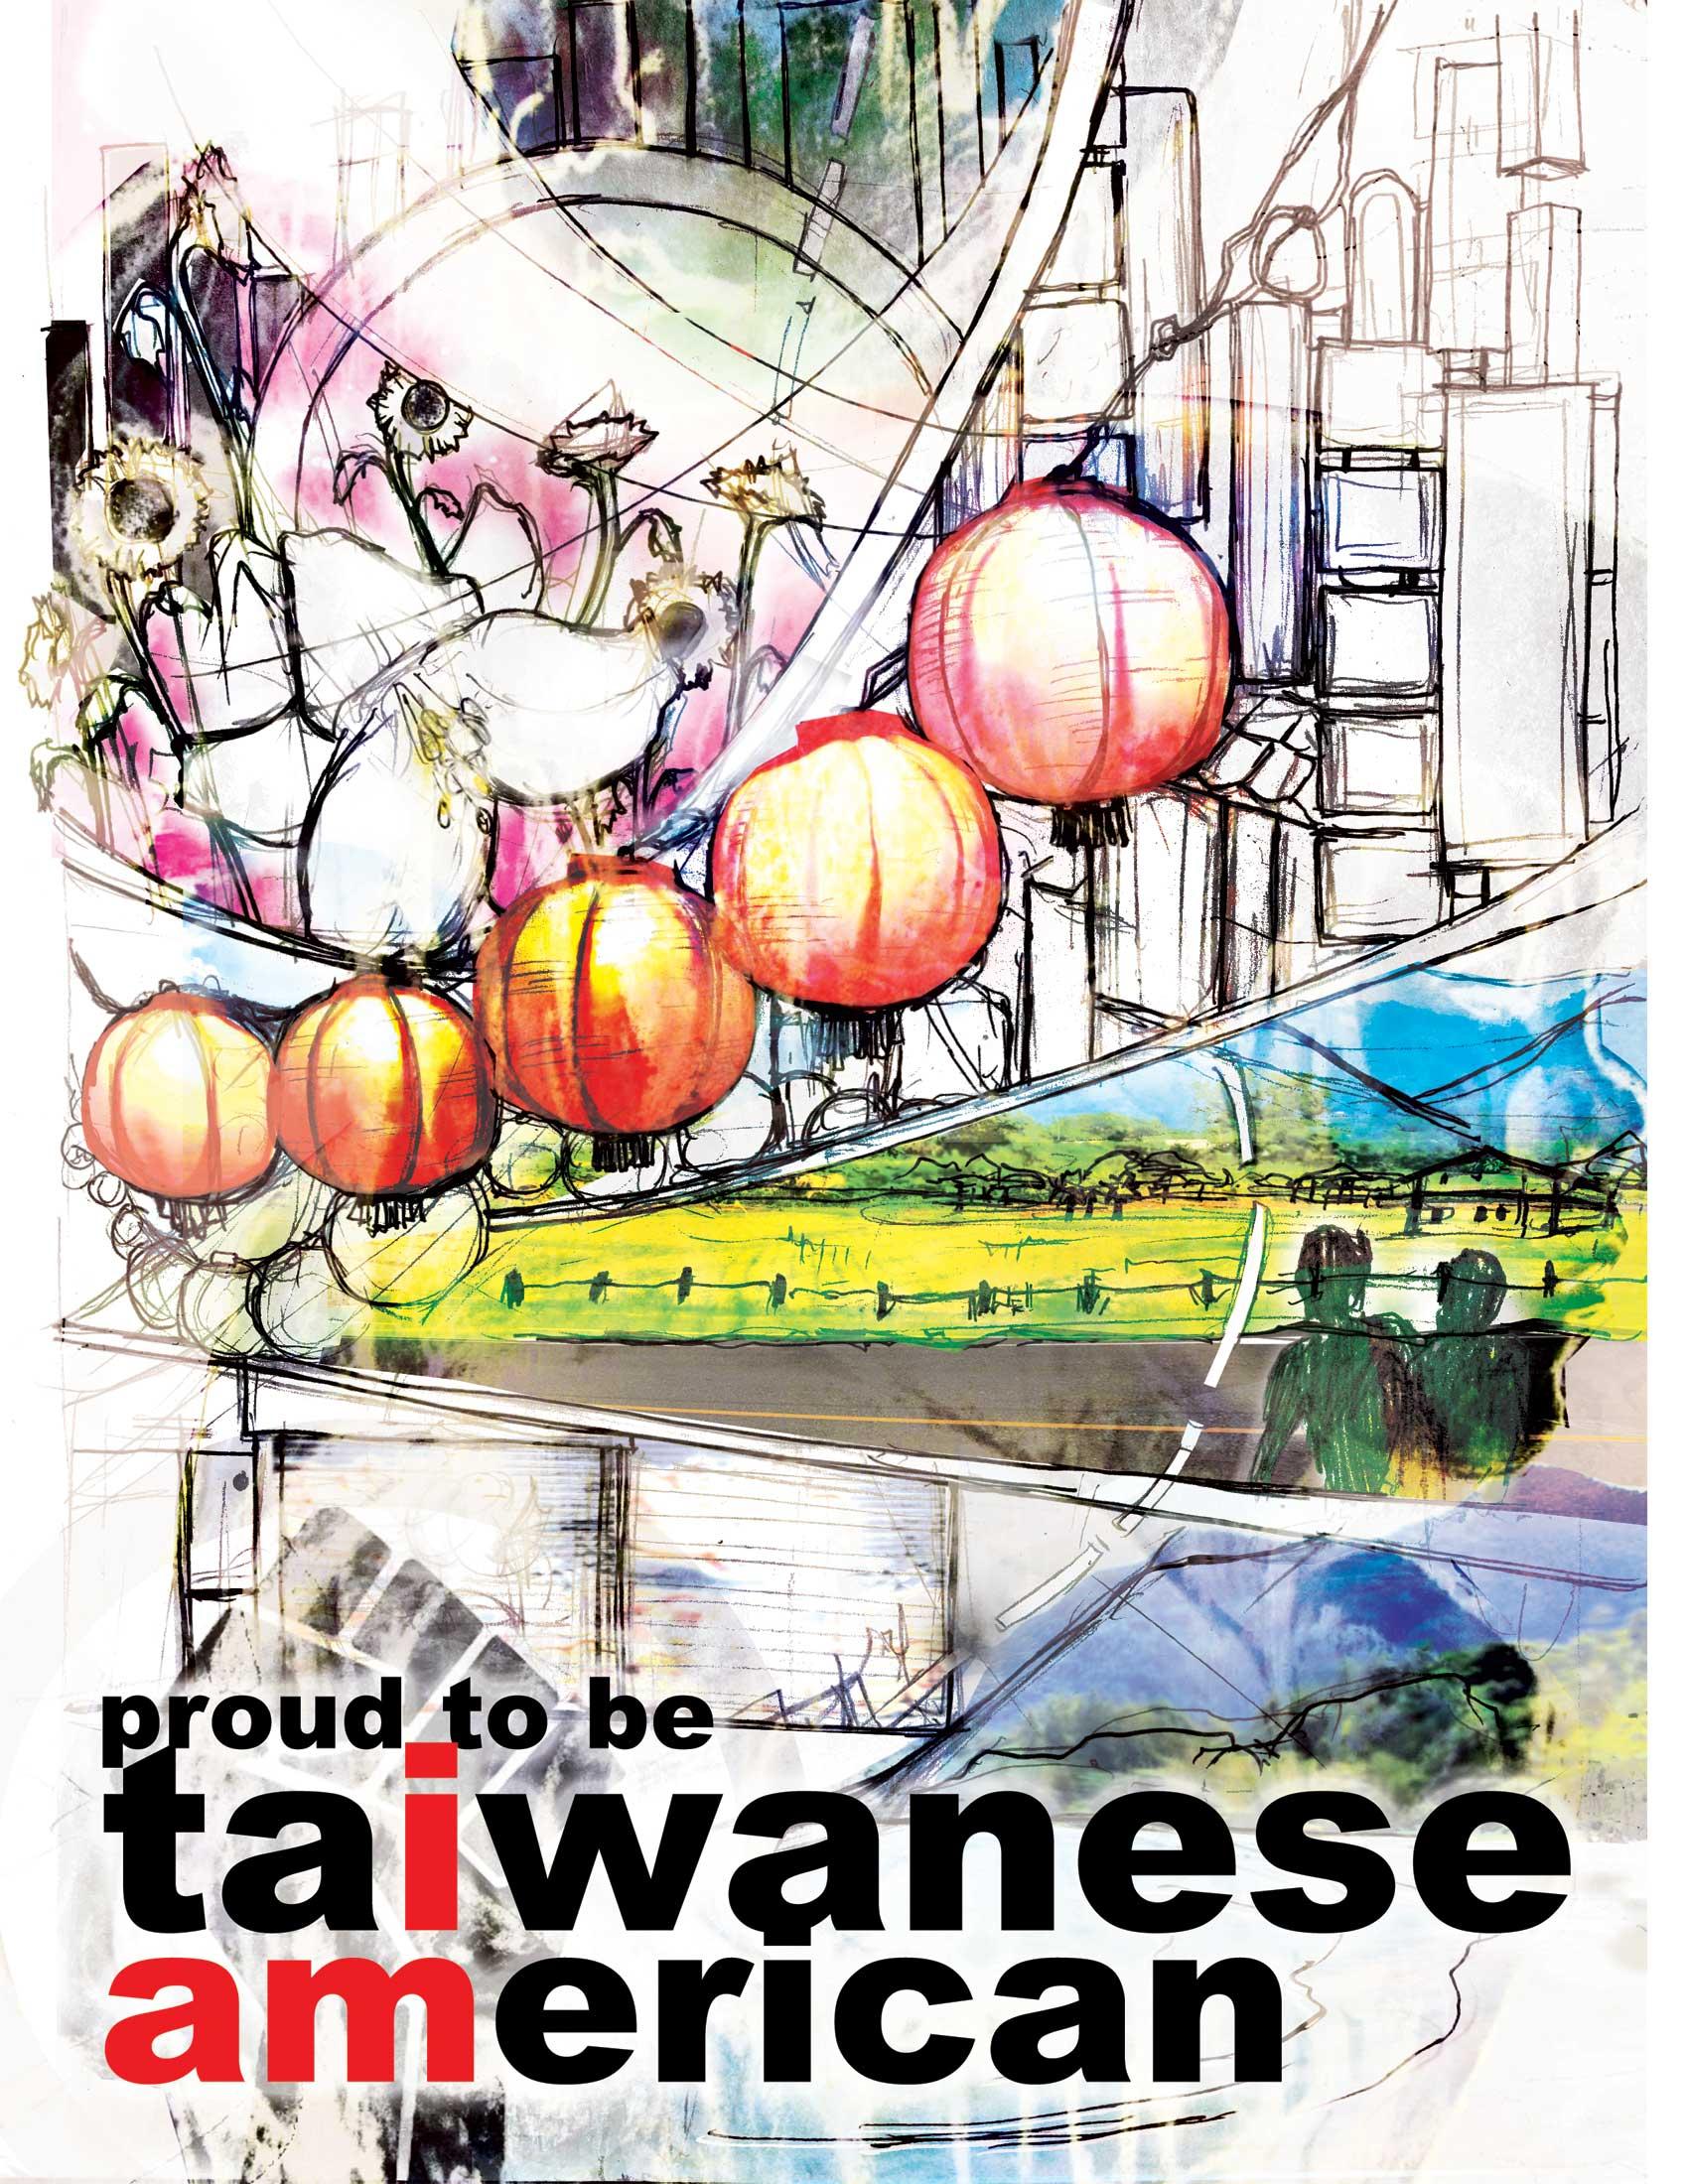 TaiwaneseAmerican.org Poster